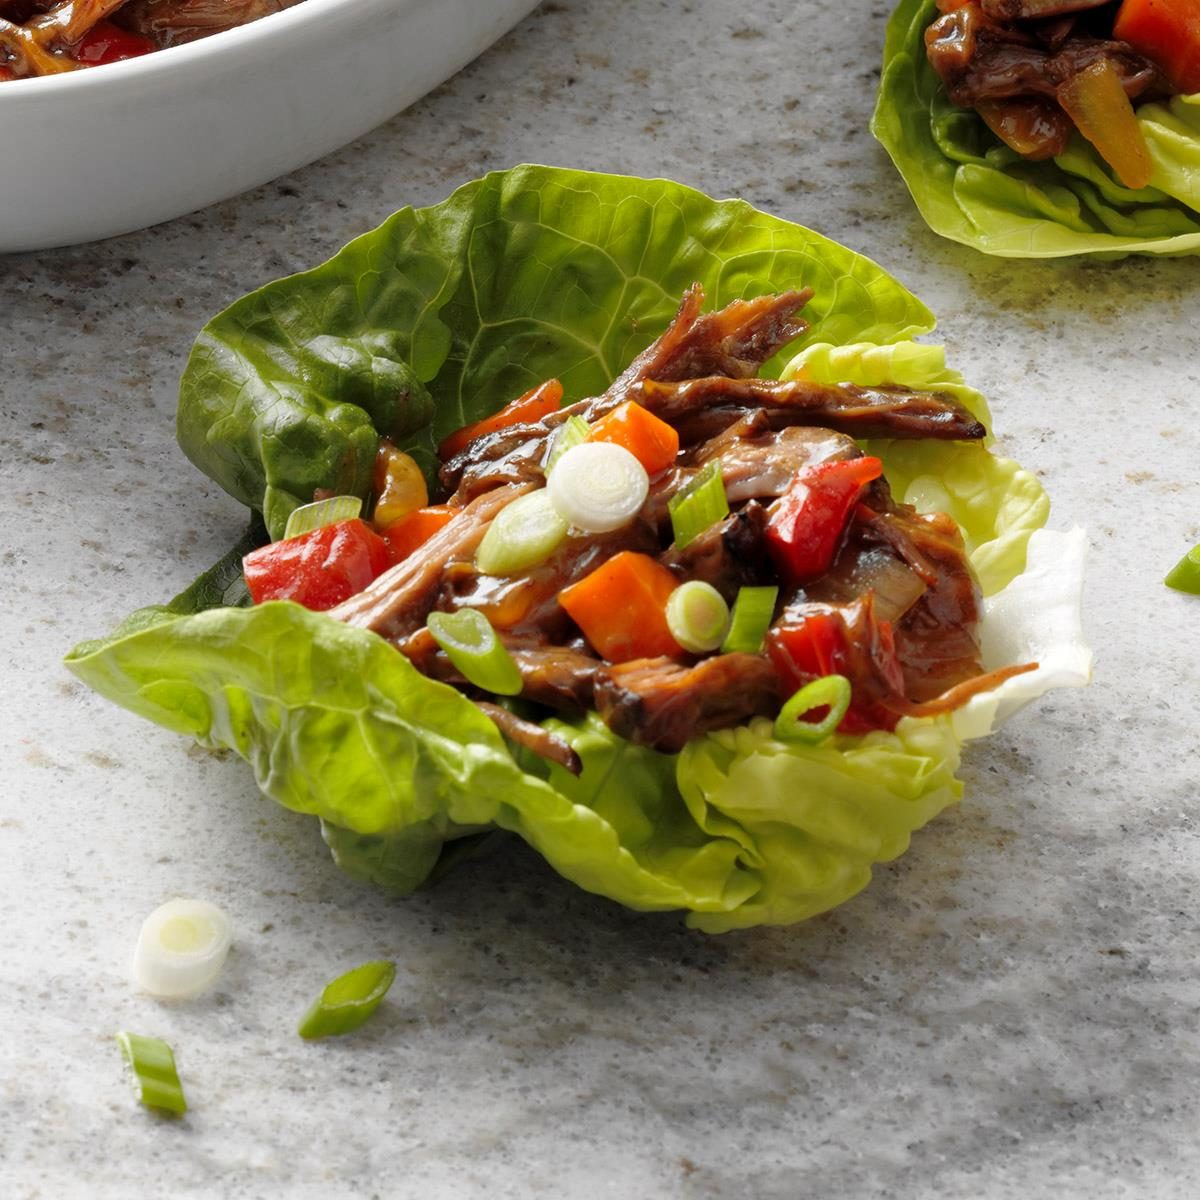 Slow-Cooker Shredded Beef Lettuce Cups